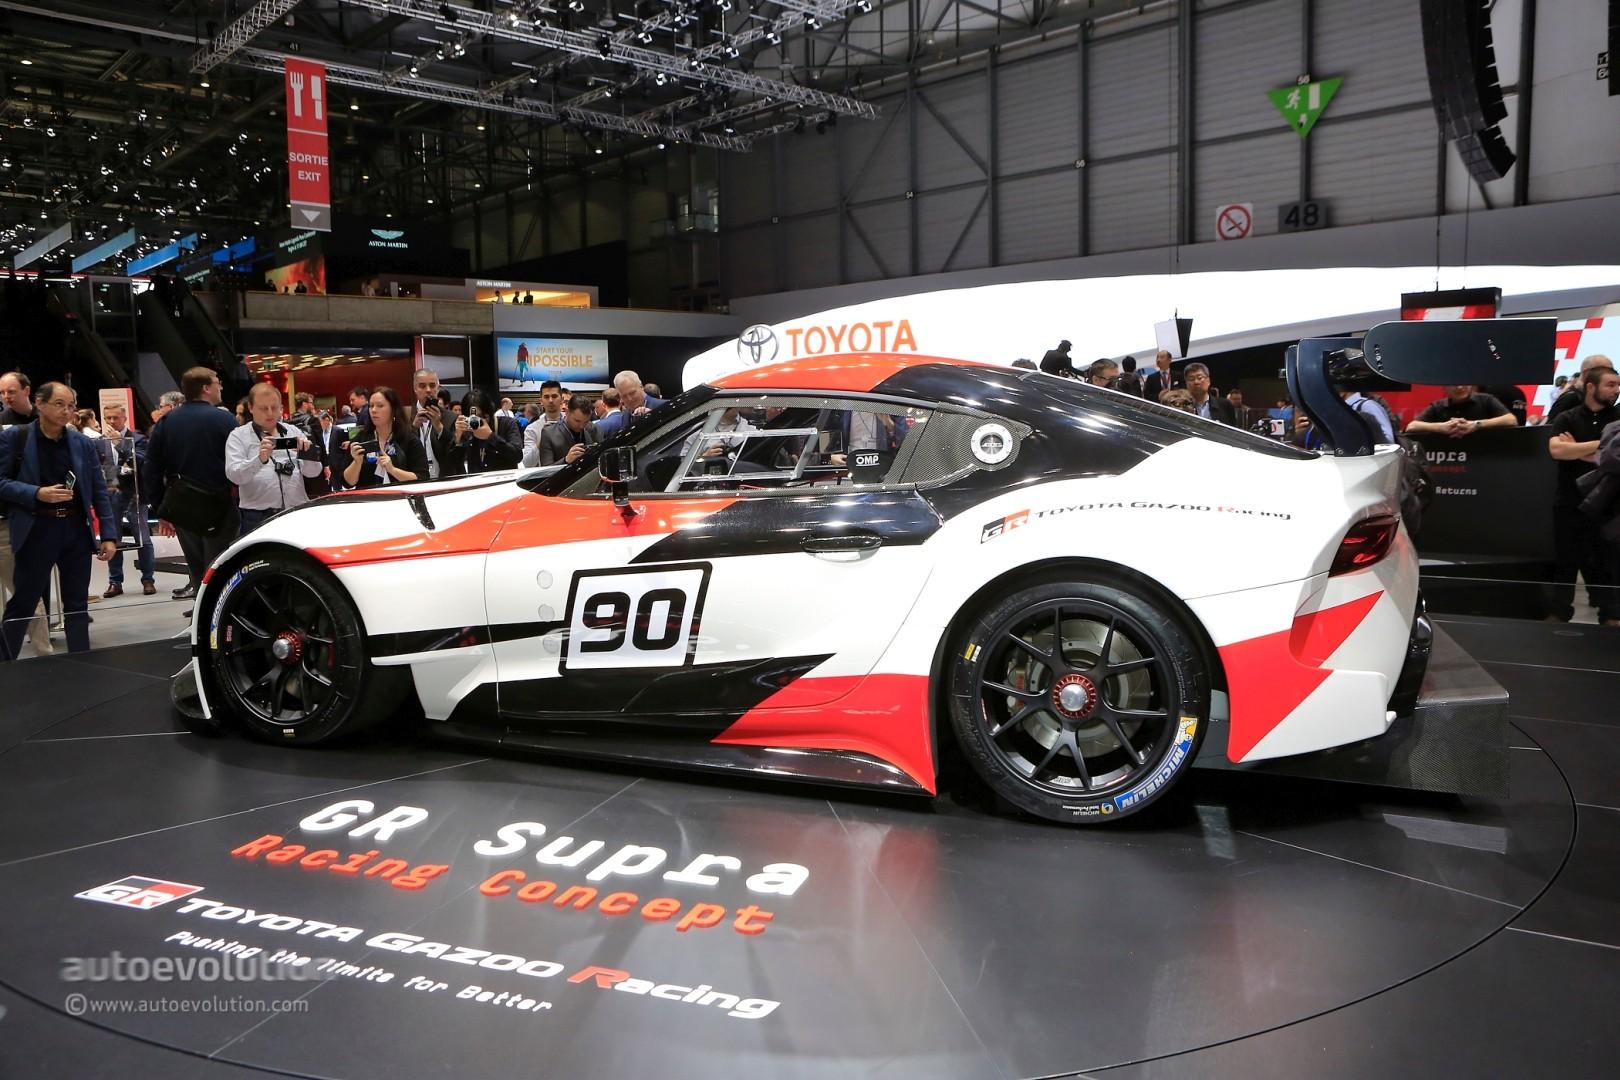 North Point Toyota >> 2019 Toyota Supra to Enter NASCAR's Xfinity Series Next Year - autoevolution